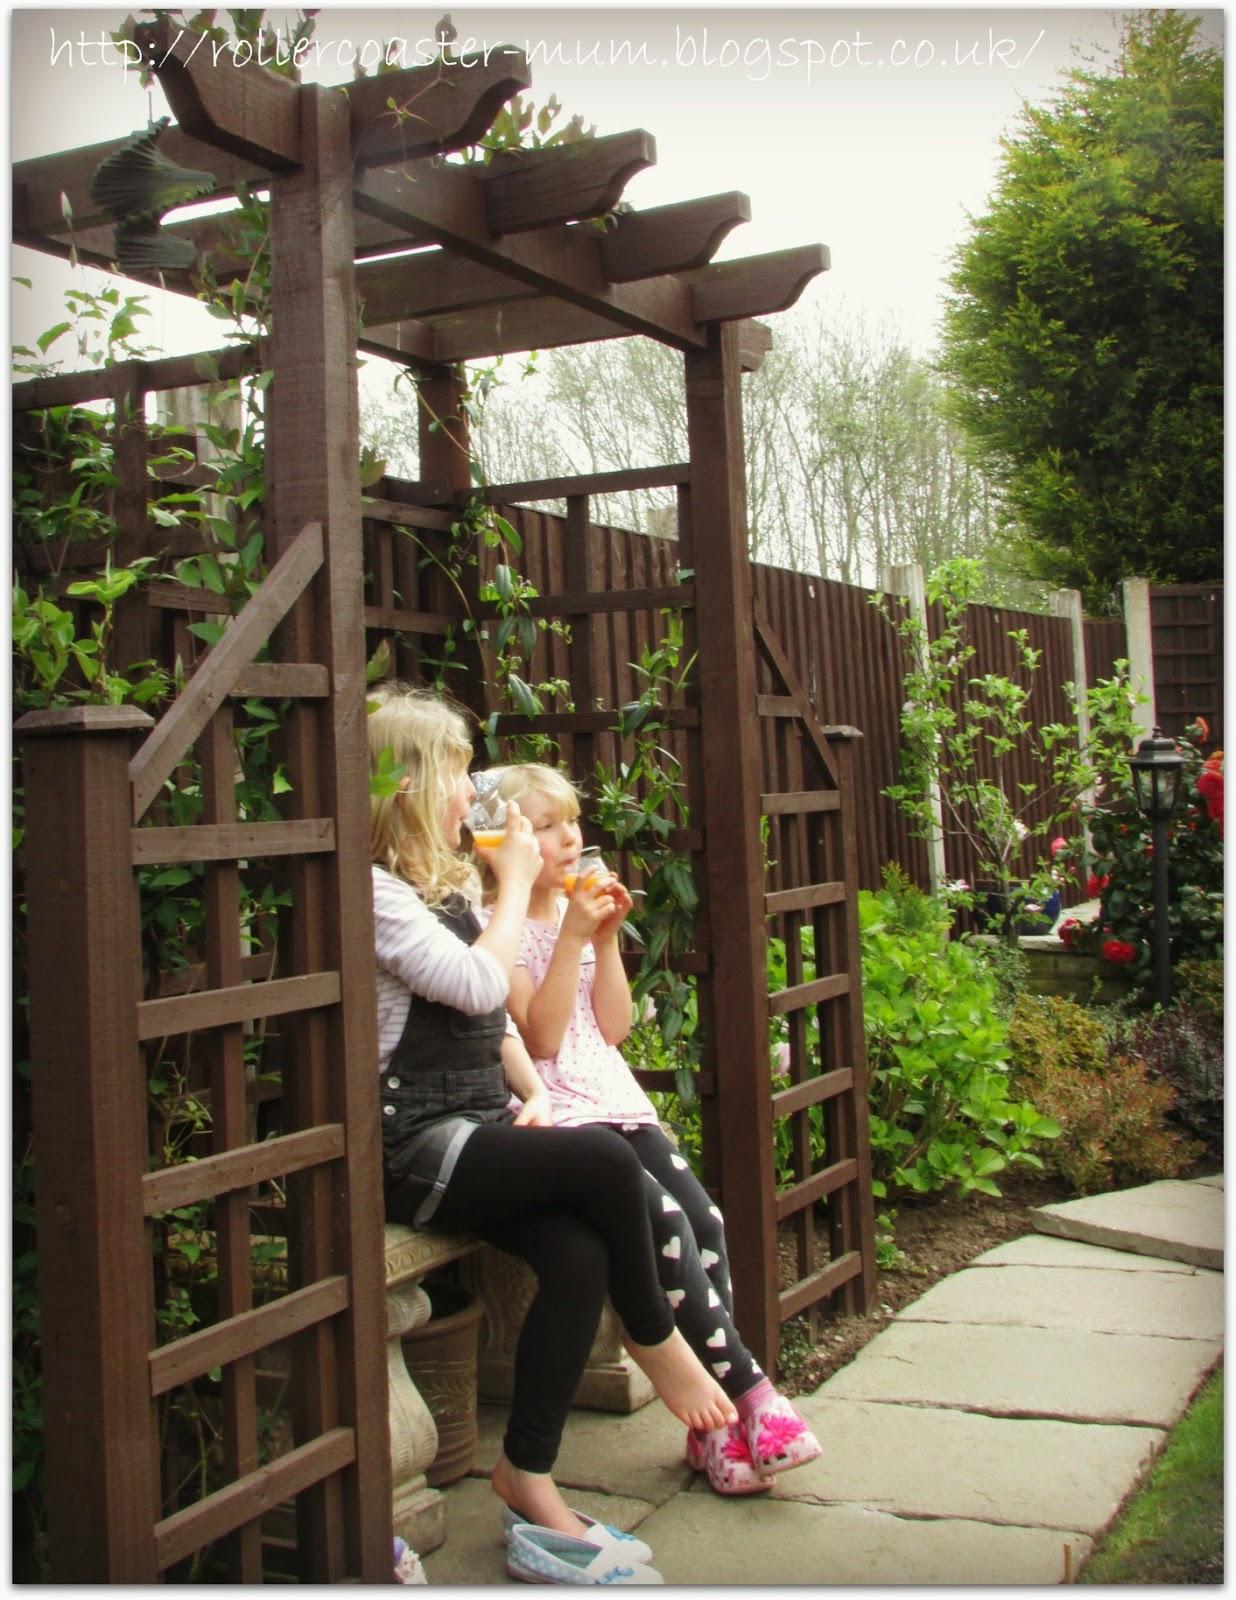 being ladylike - drinks in the garden